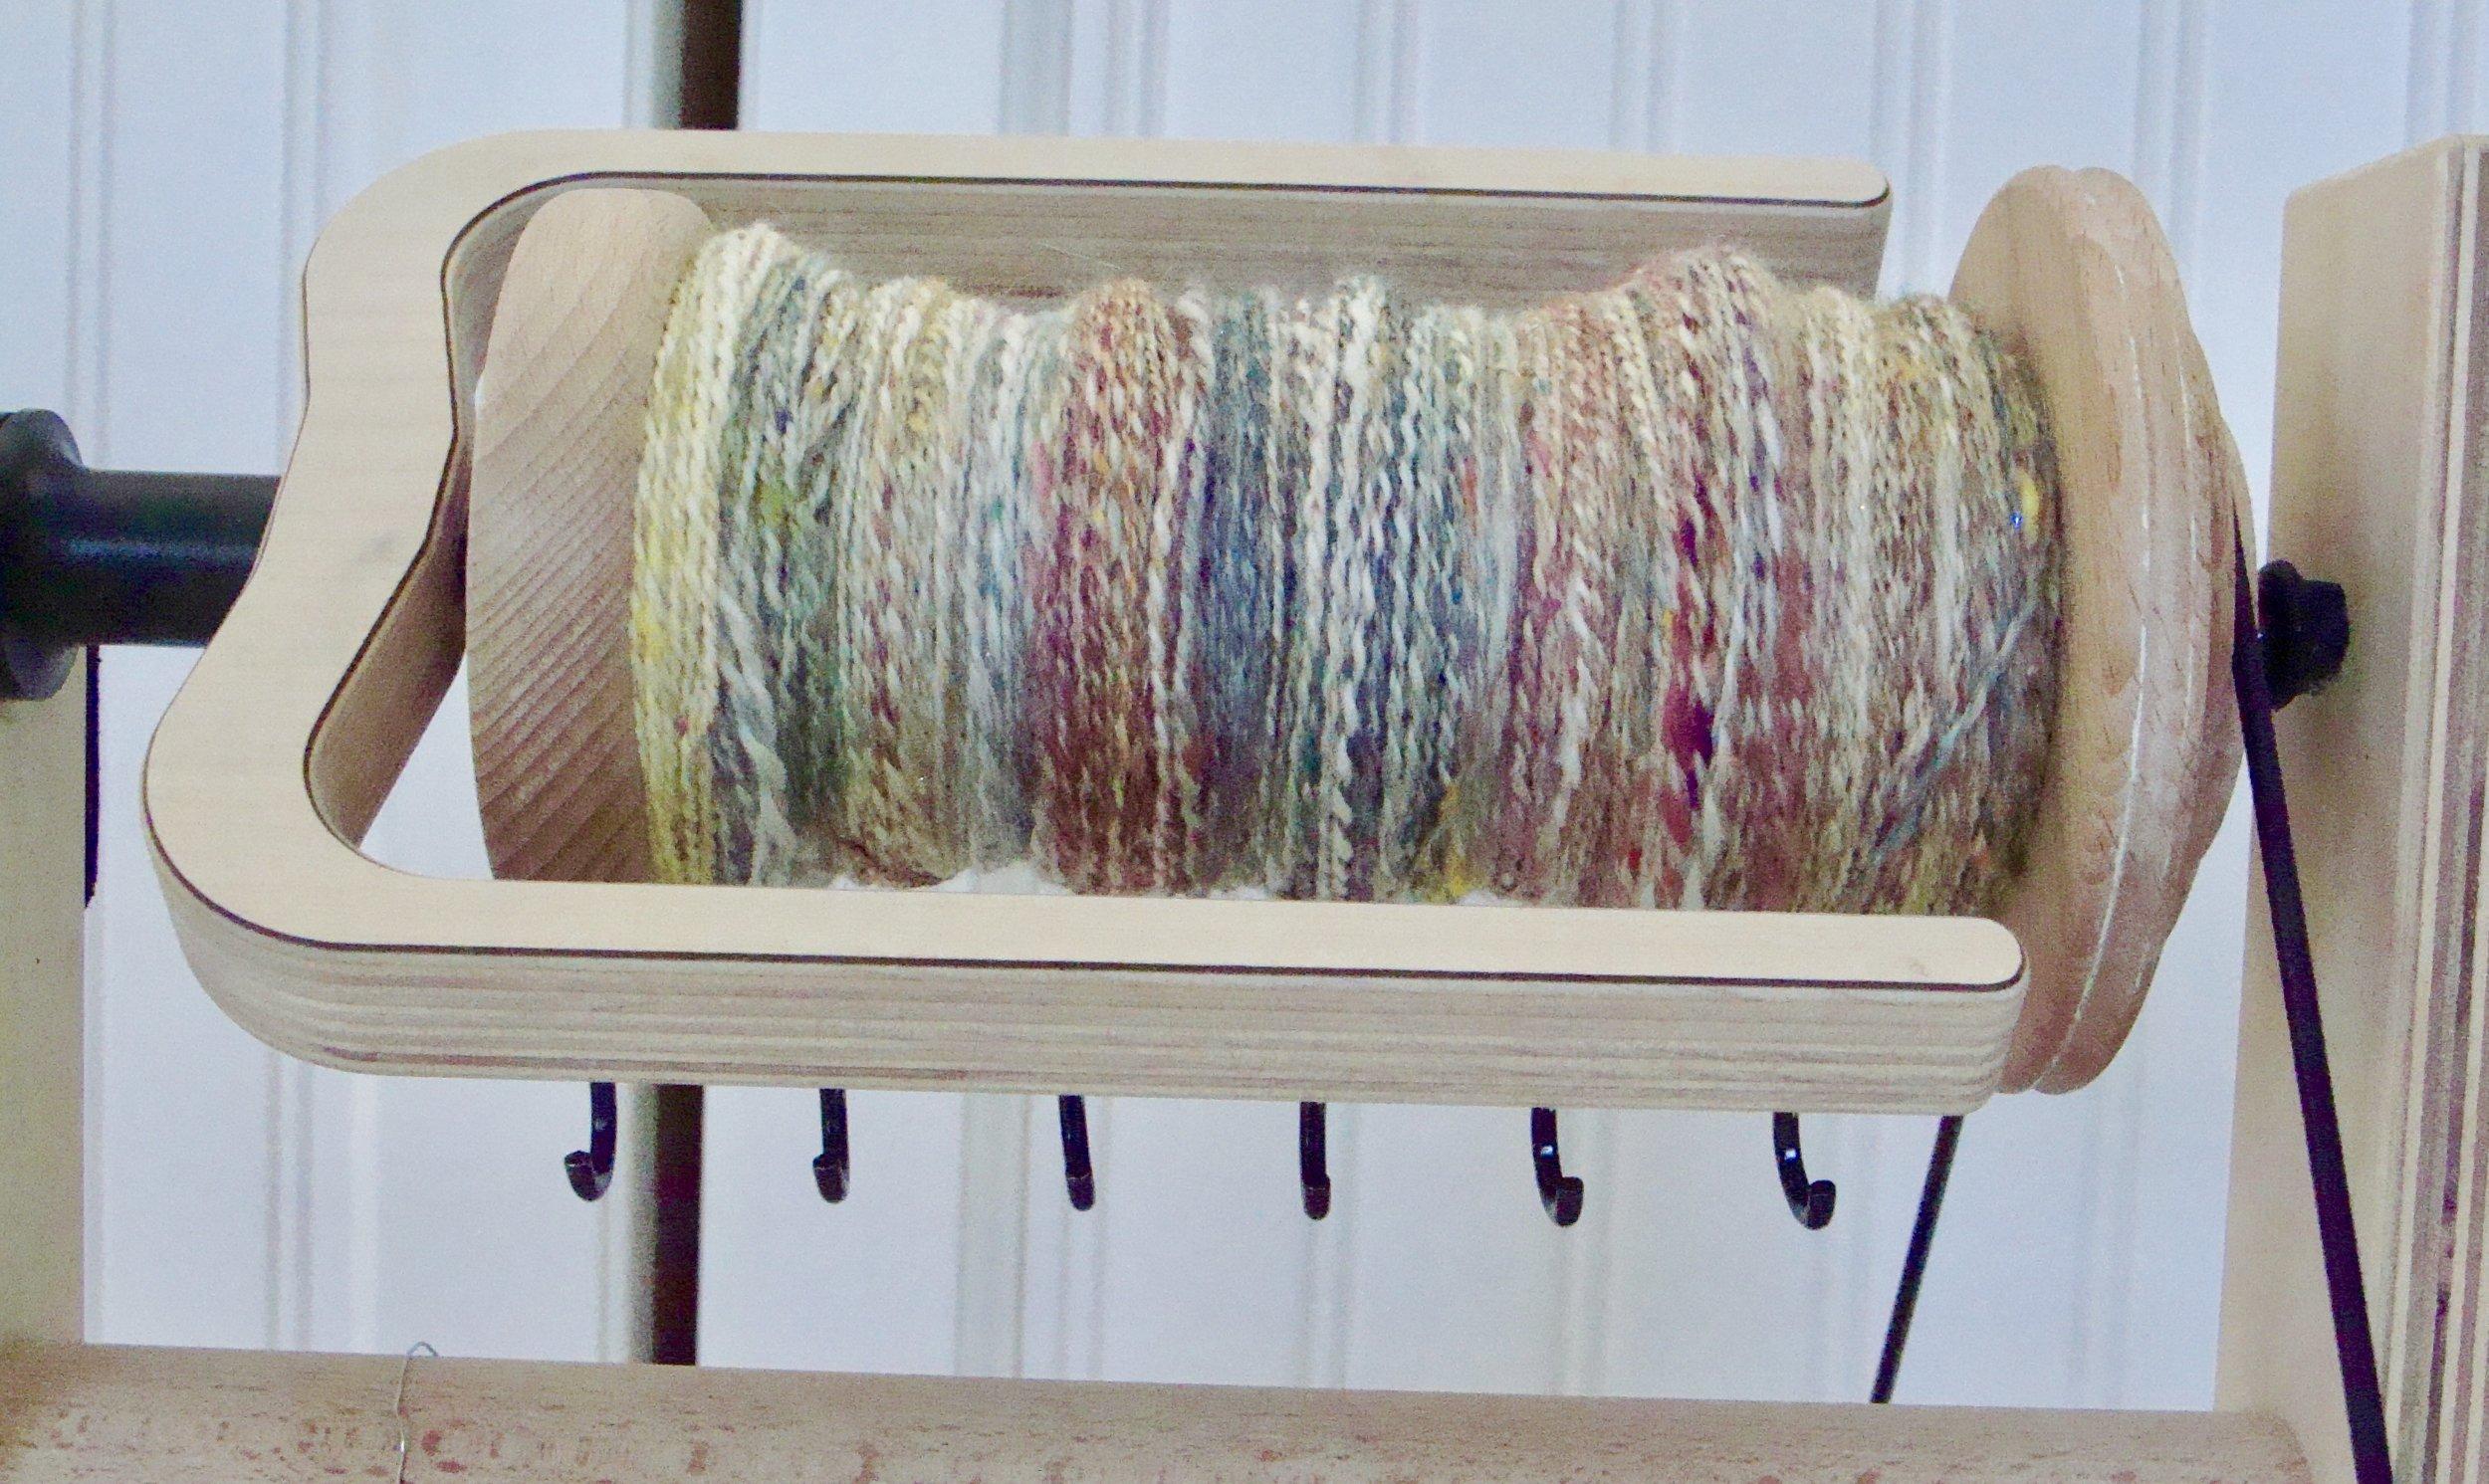 2 ply-handspan-yarn-bobbin